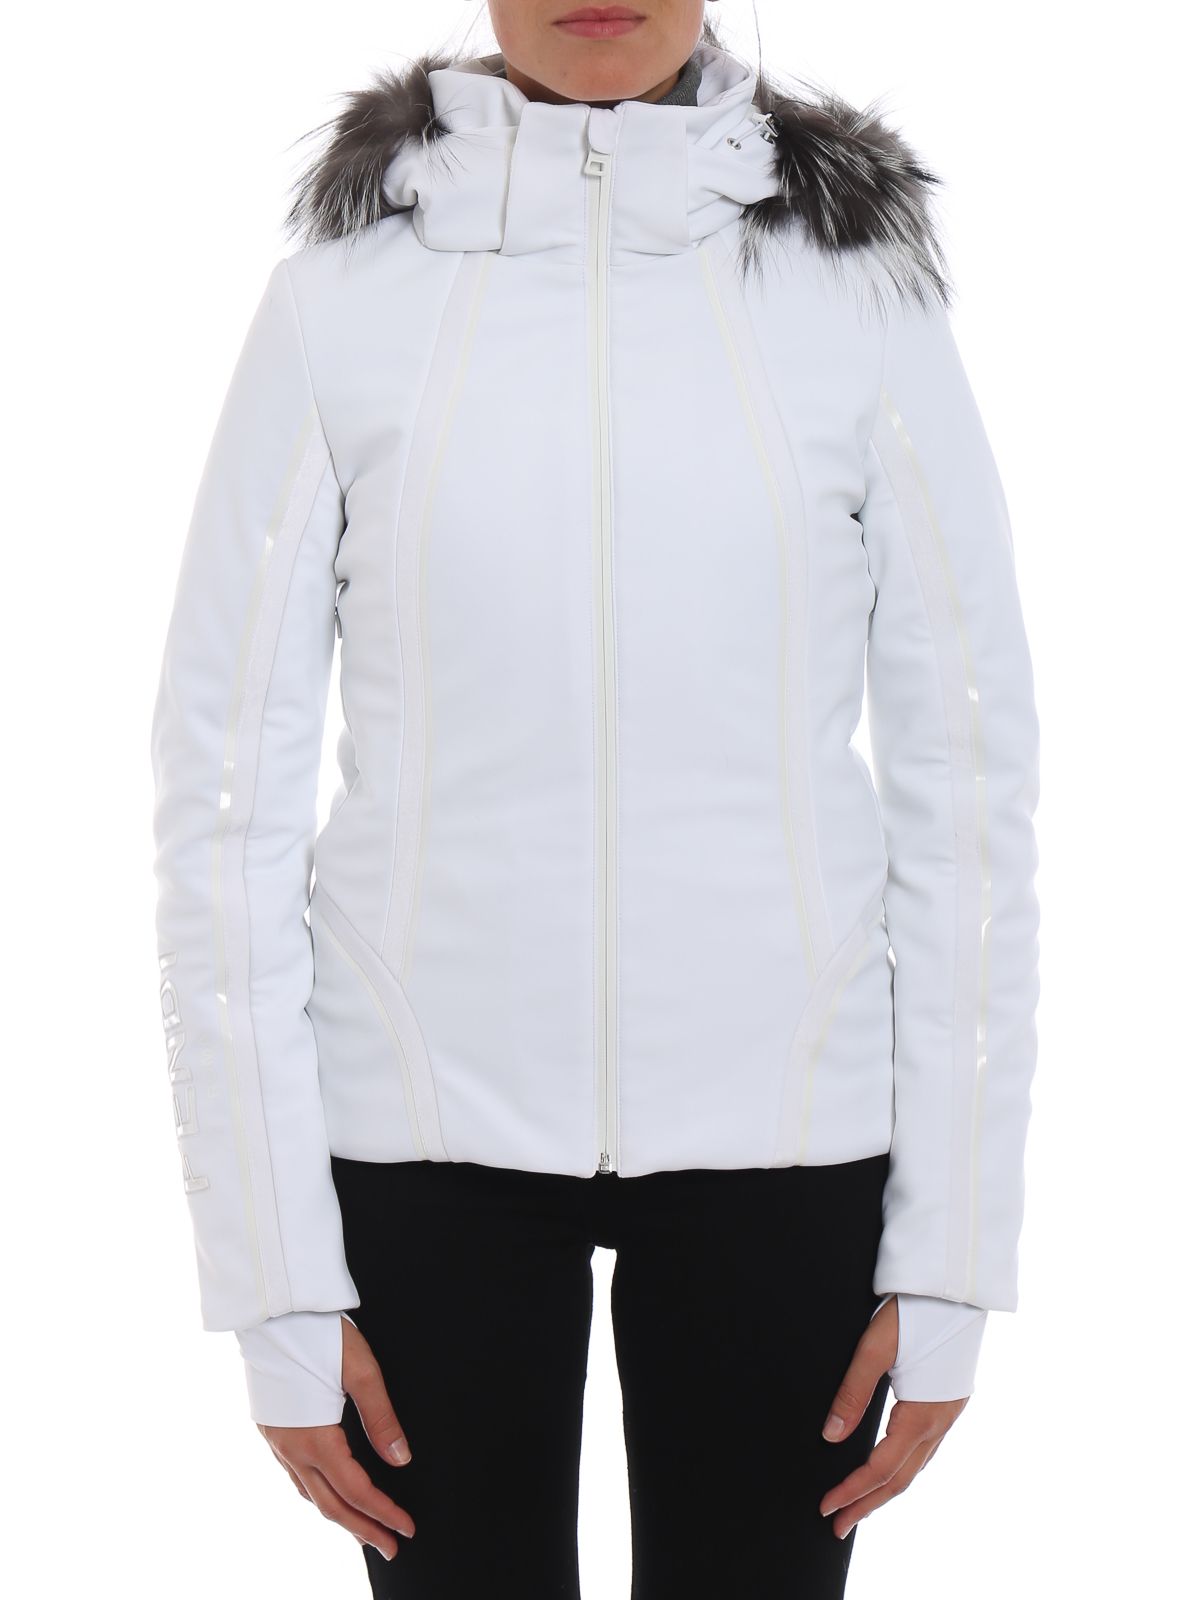 iKRIX FENDI  padded jackets - Hi-tech ski jacket with fox fur inserts aba442131